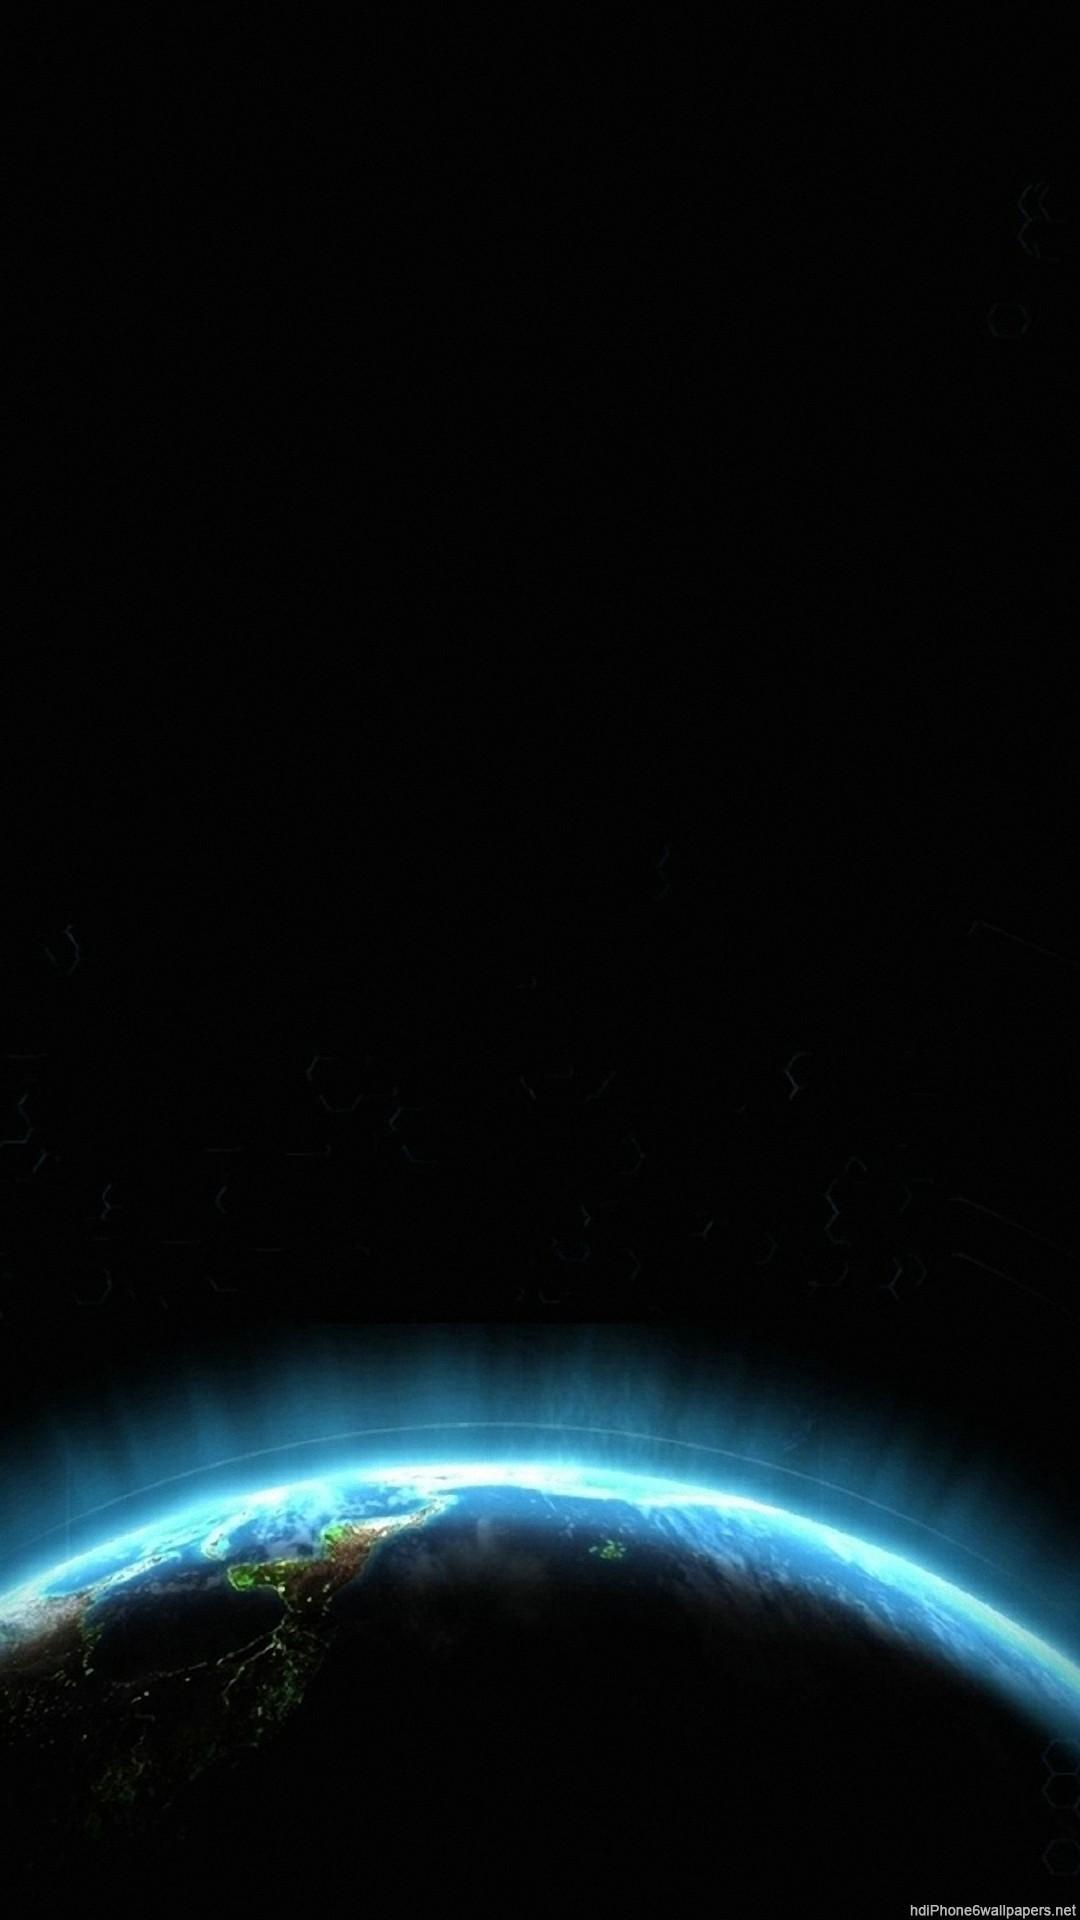 Cute Alien Iphone Wallpaper 1440x2560 Wallpaper Vertical 93 Images